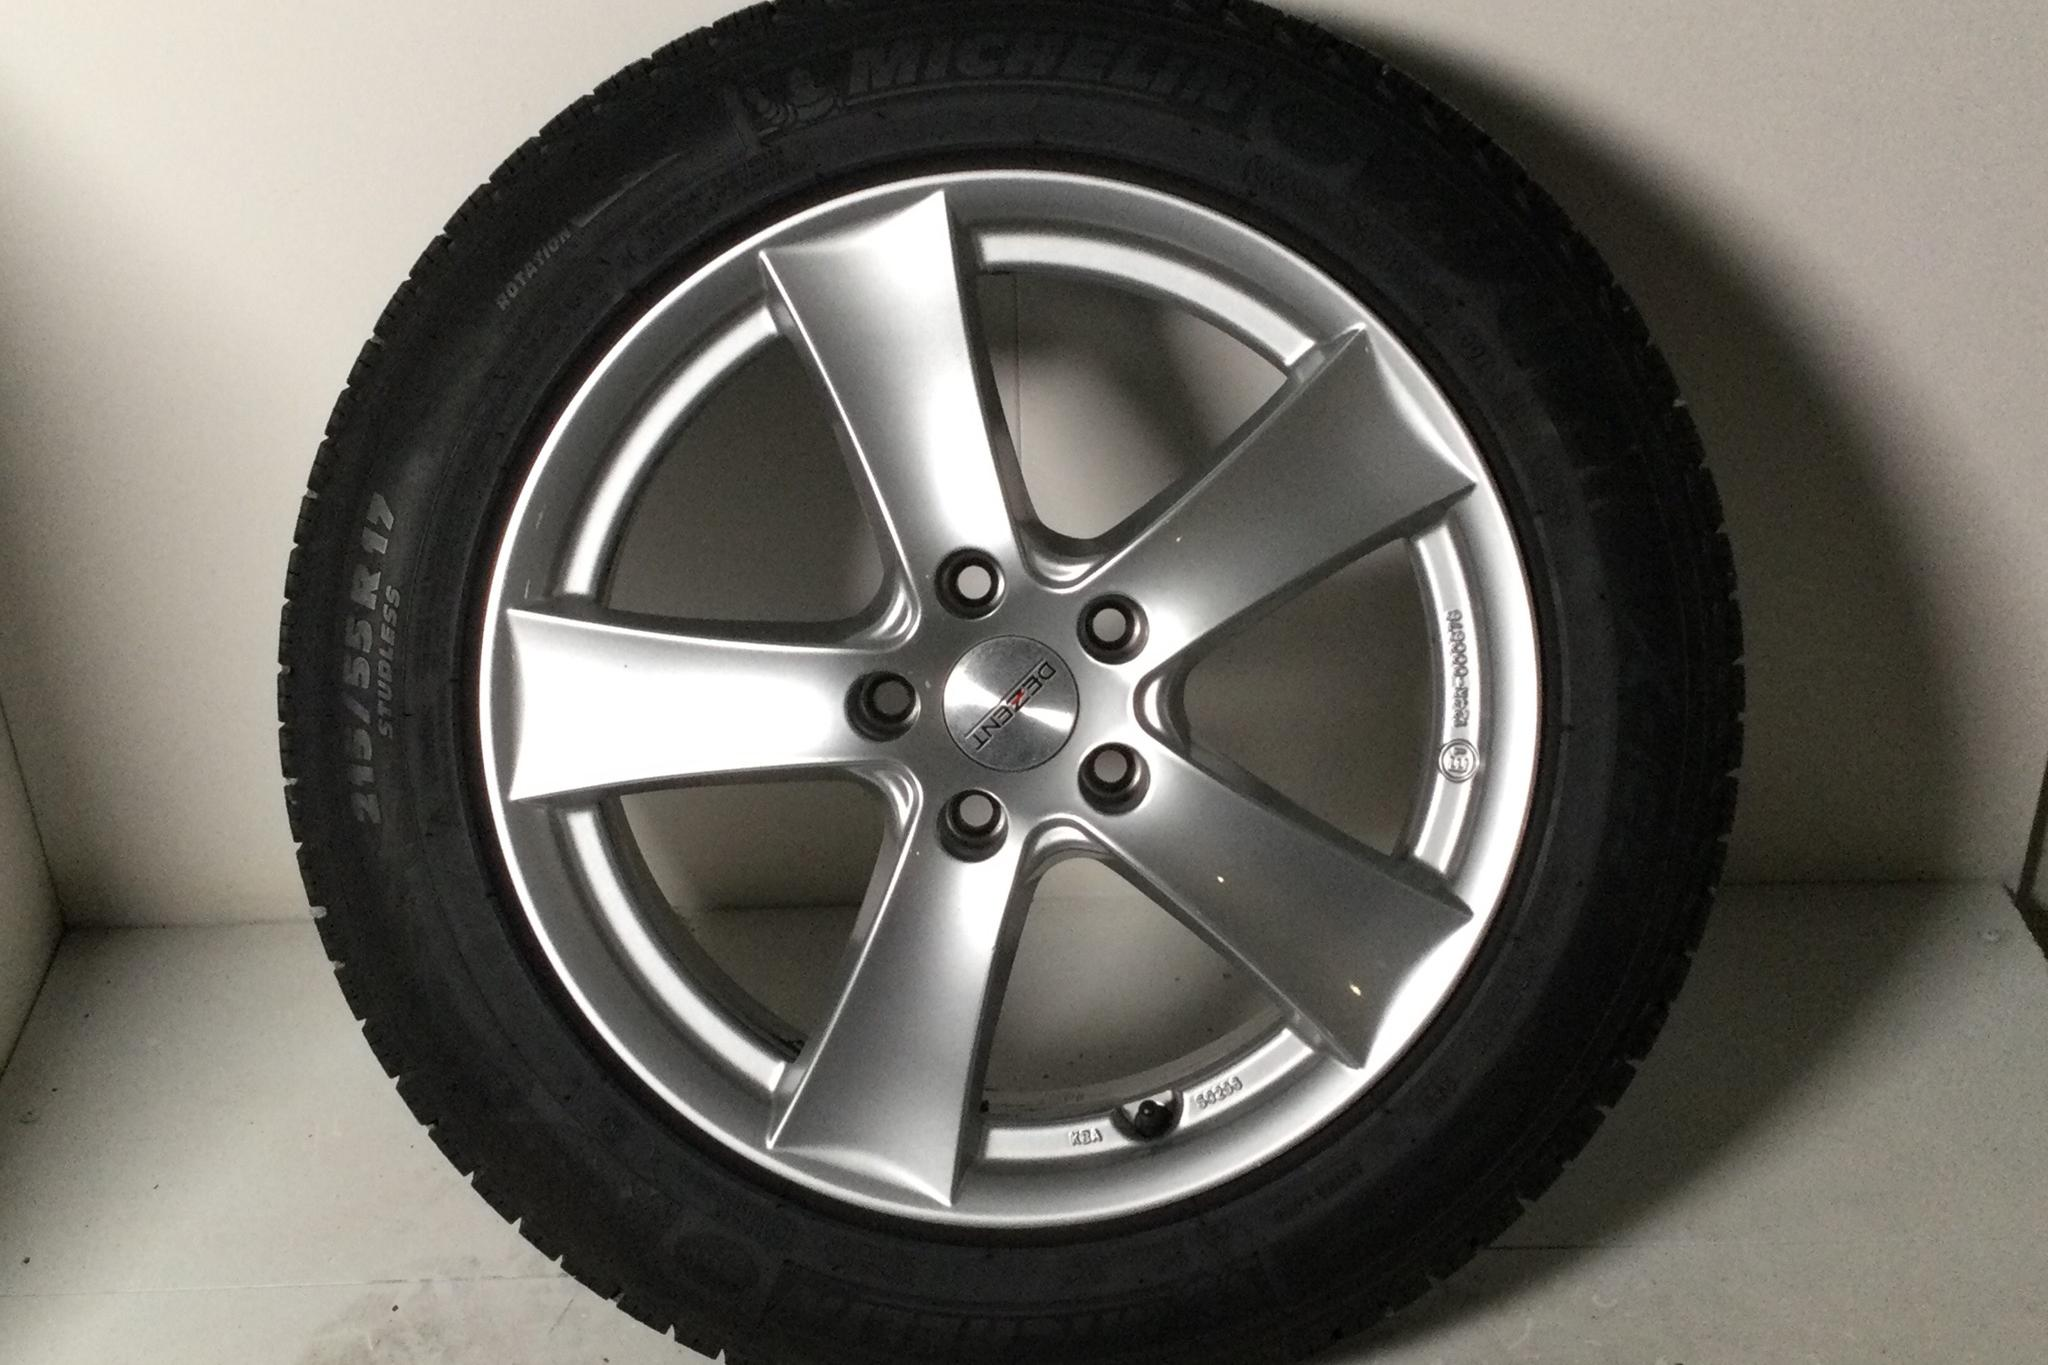 VW Passat 1.4 Plug-in-Hybrid Sportscombi (218hk) - 5 663 mil - Automat - silver - 2018